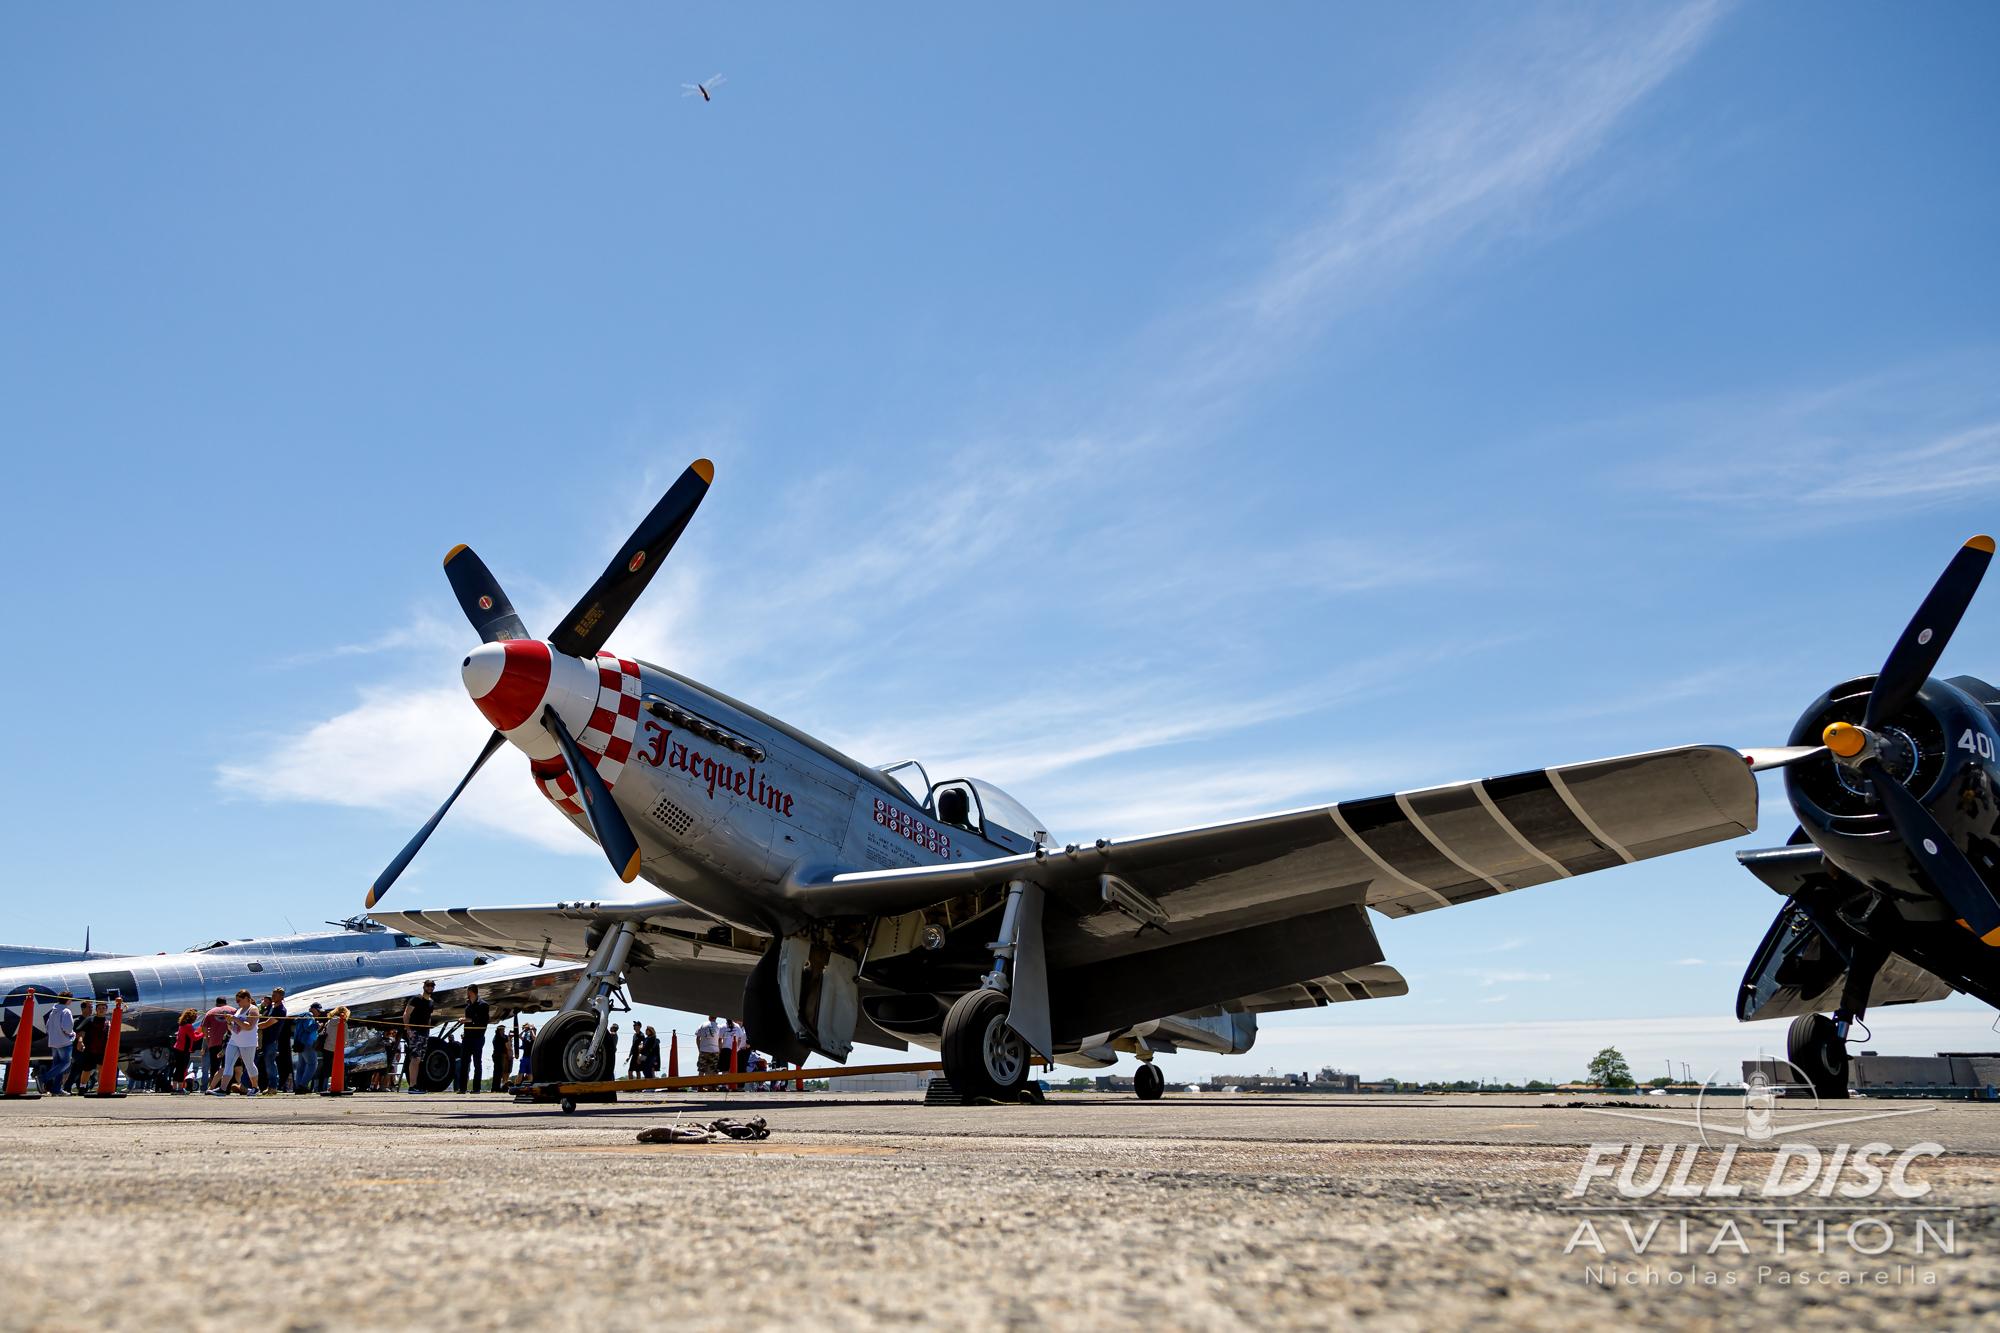 americanairpowermuseum_nicholaspascarella_nickpascarella_fulldiscaviation_legendsofairpower2019_aviation_warbird_p51mustang_static_mustang.jpg